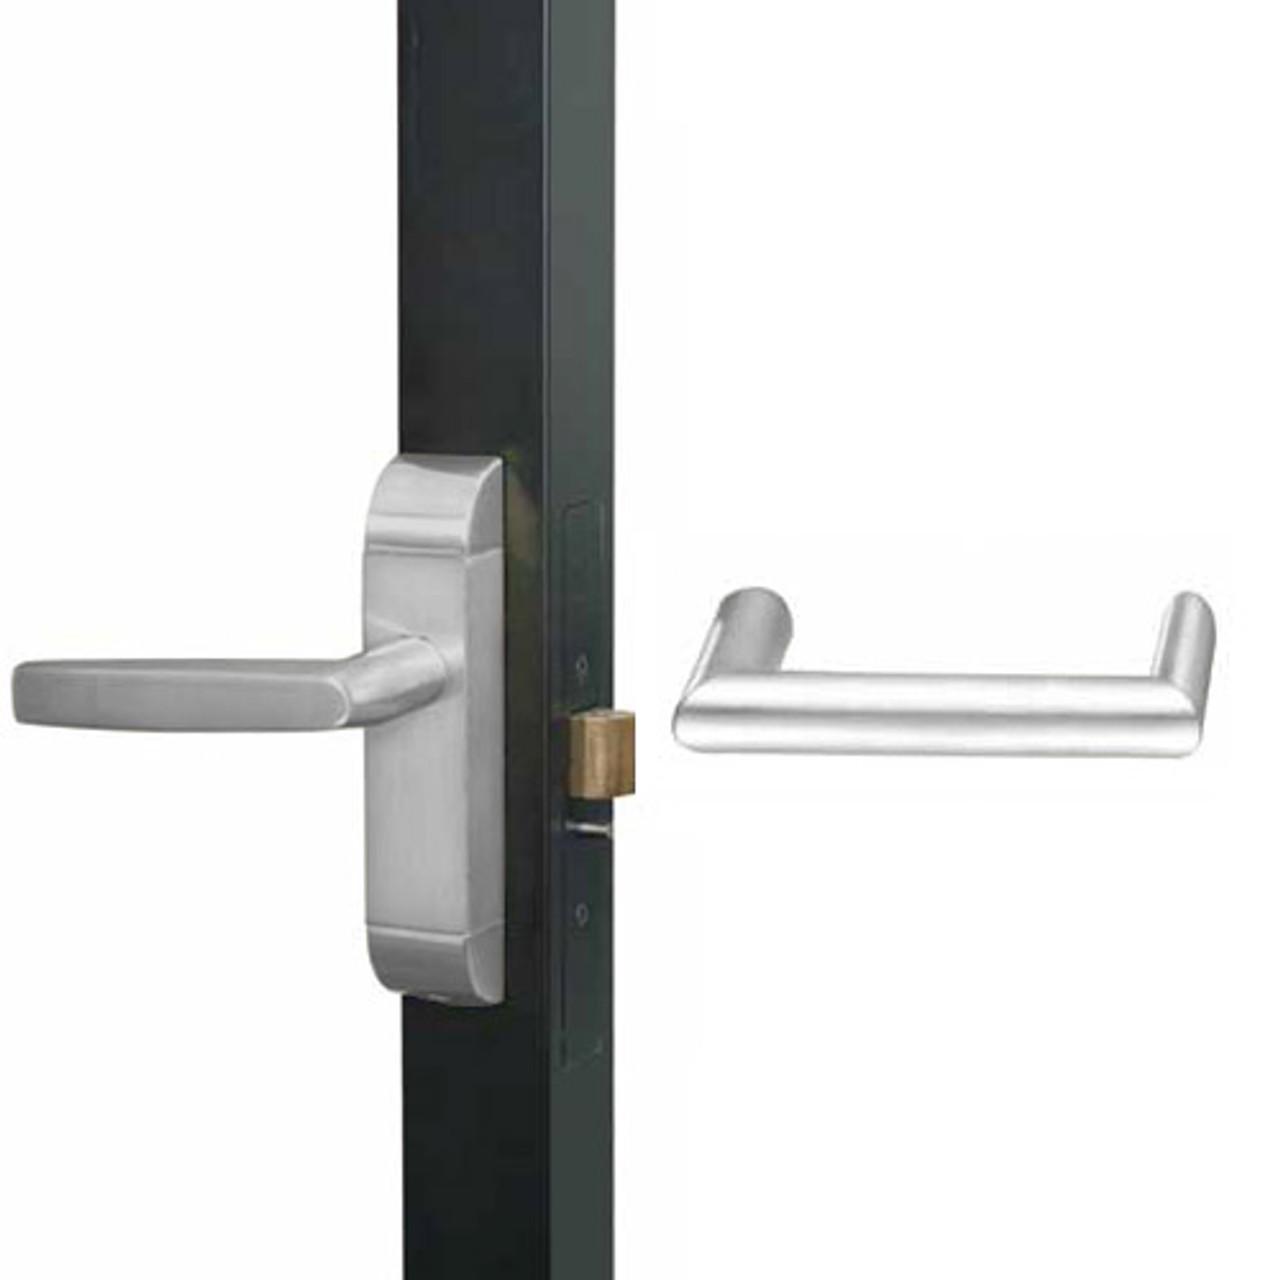 4600-MW-632-US32 Adams Rite MW Designer Deadlatch handle in Bright Stainless Finish